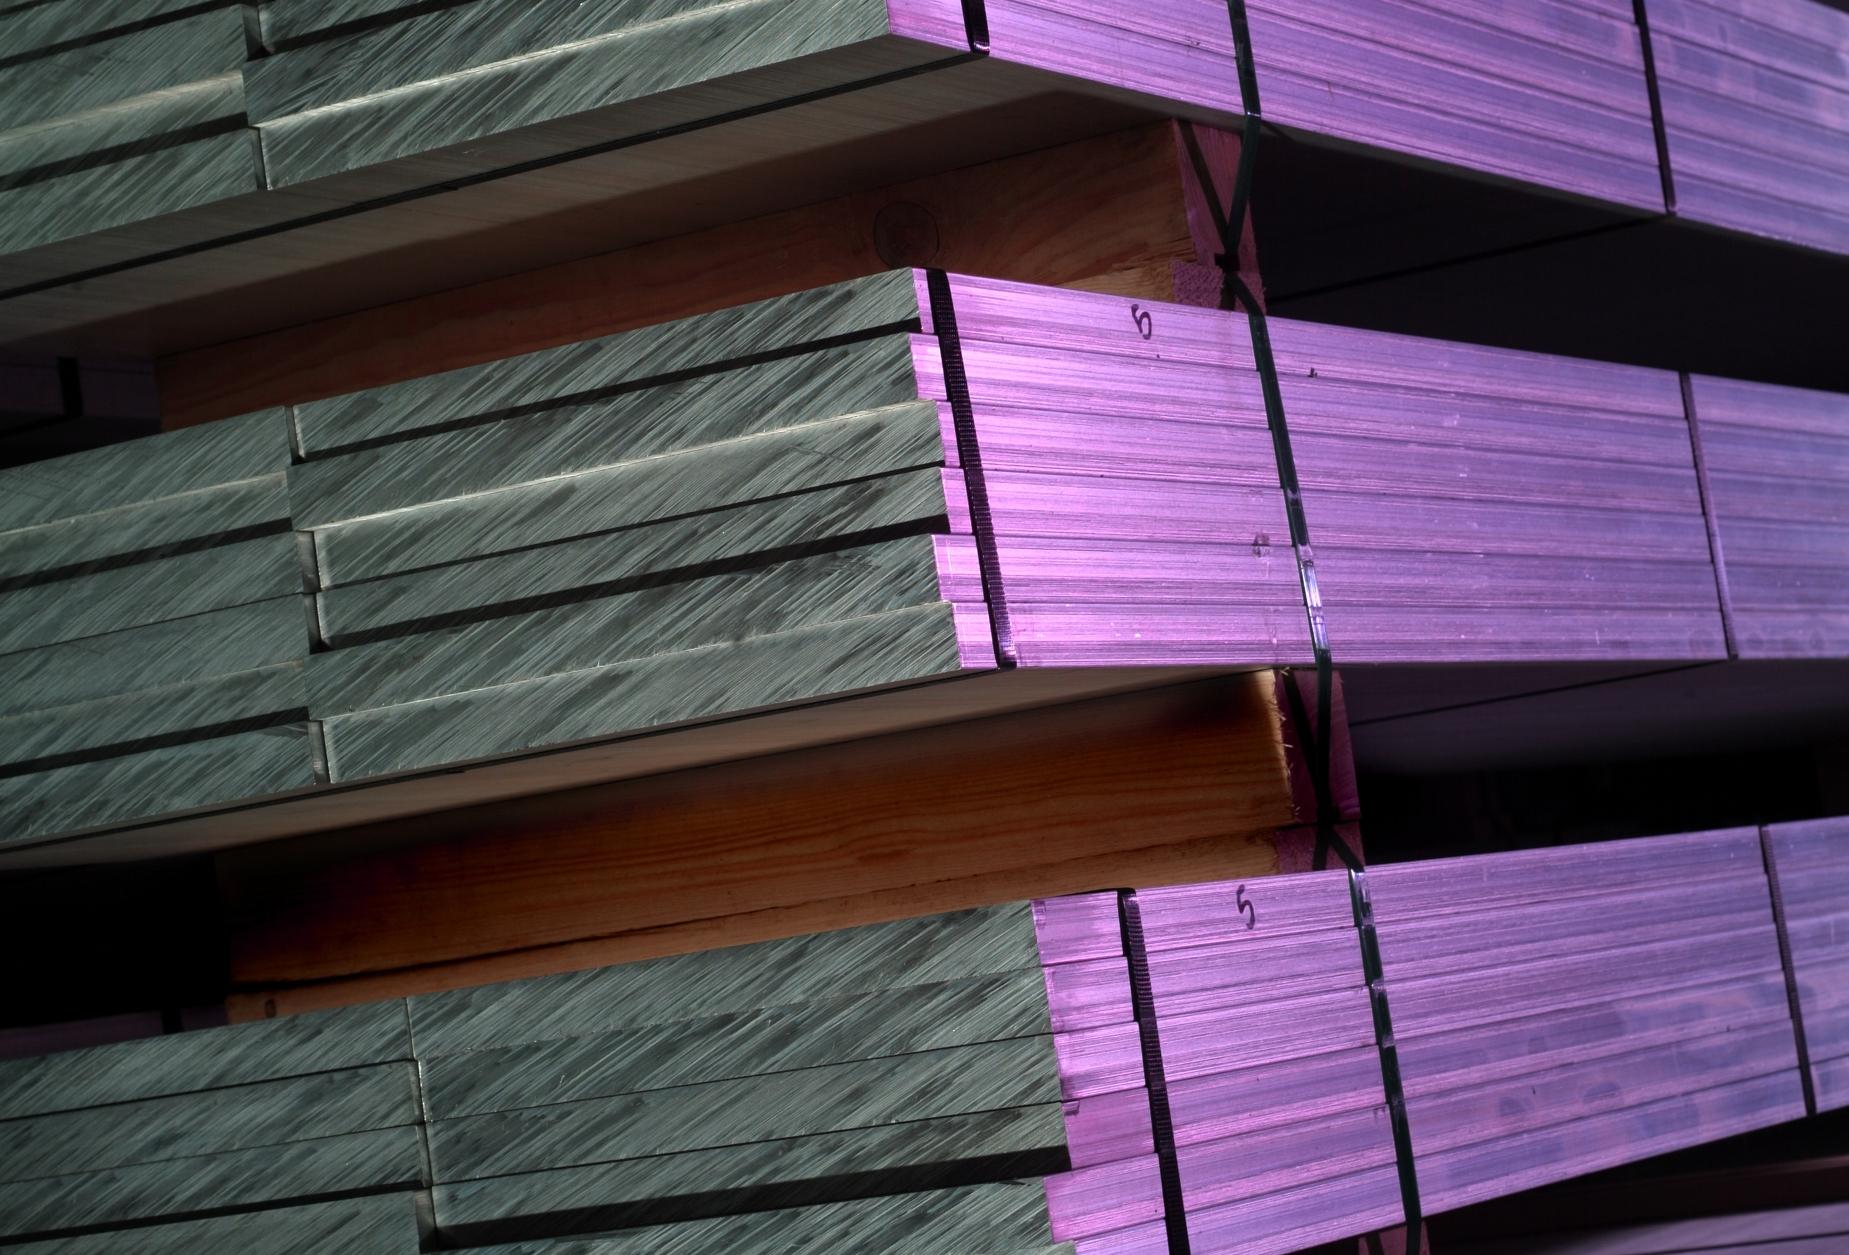 Aluminium Extruded Bar | Metal Web | UK metals stockholder